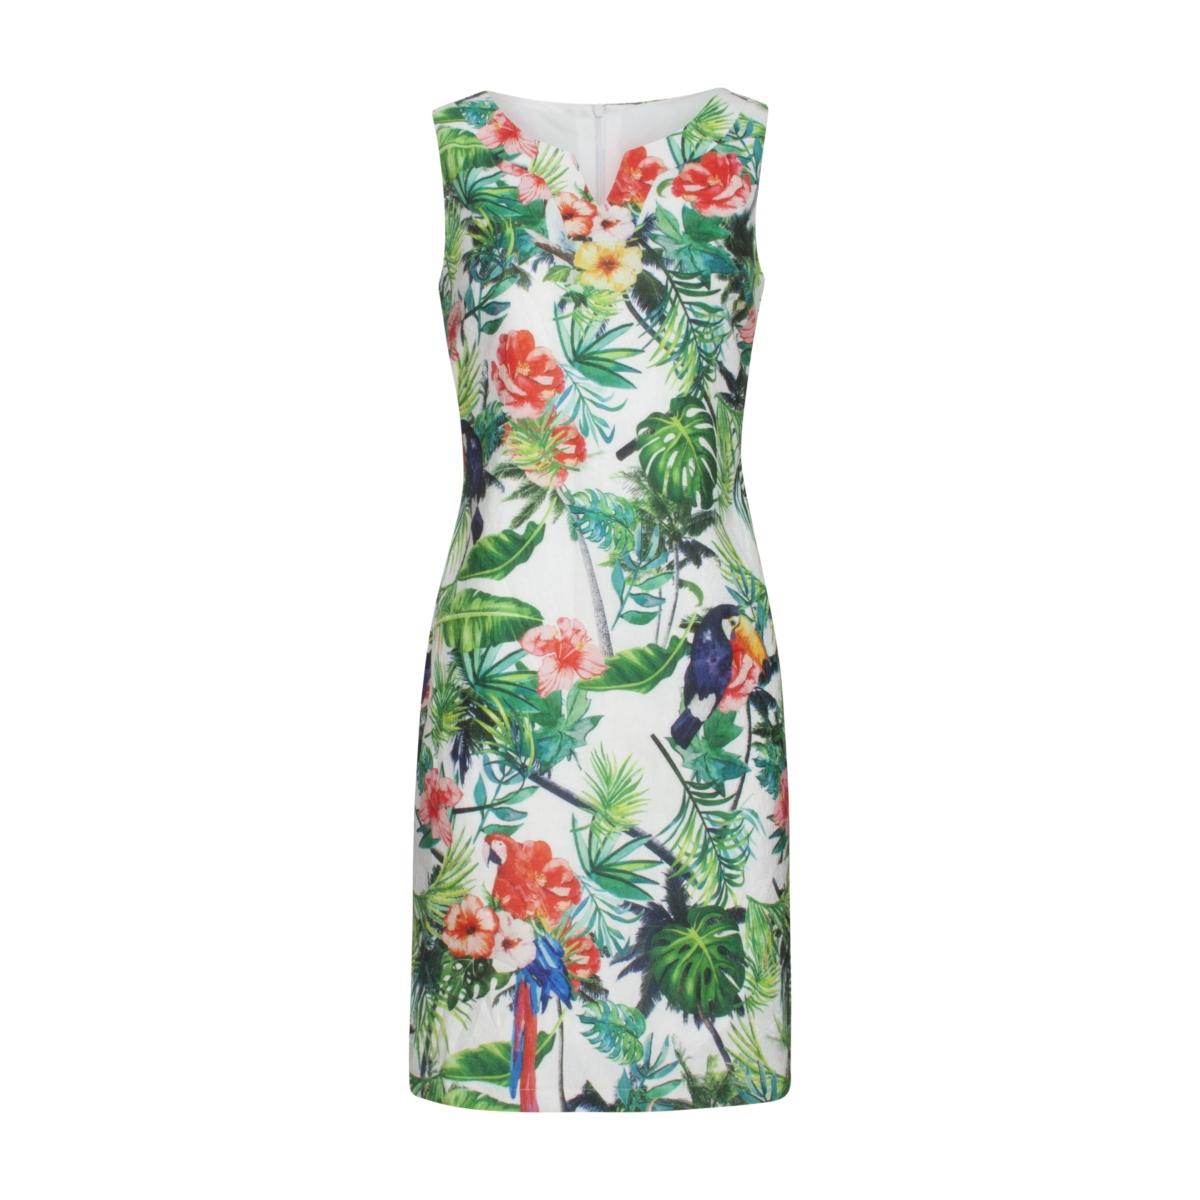 dress 19190 smashed lemon jurk white/green